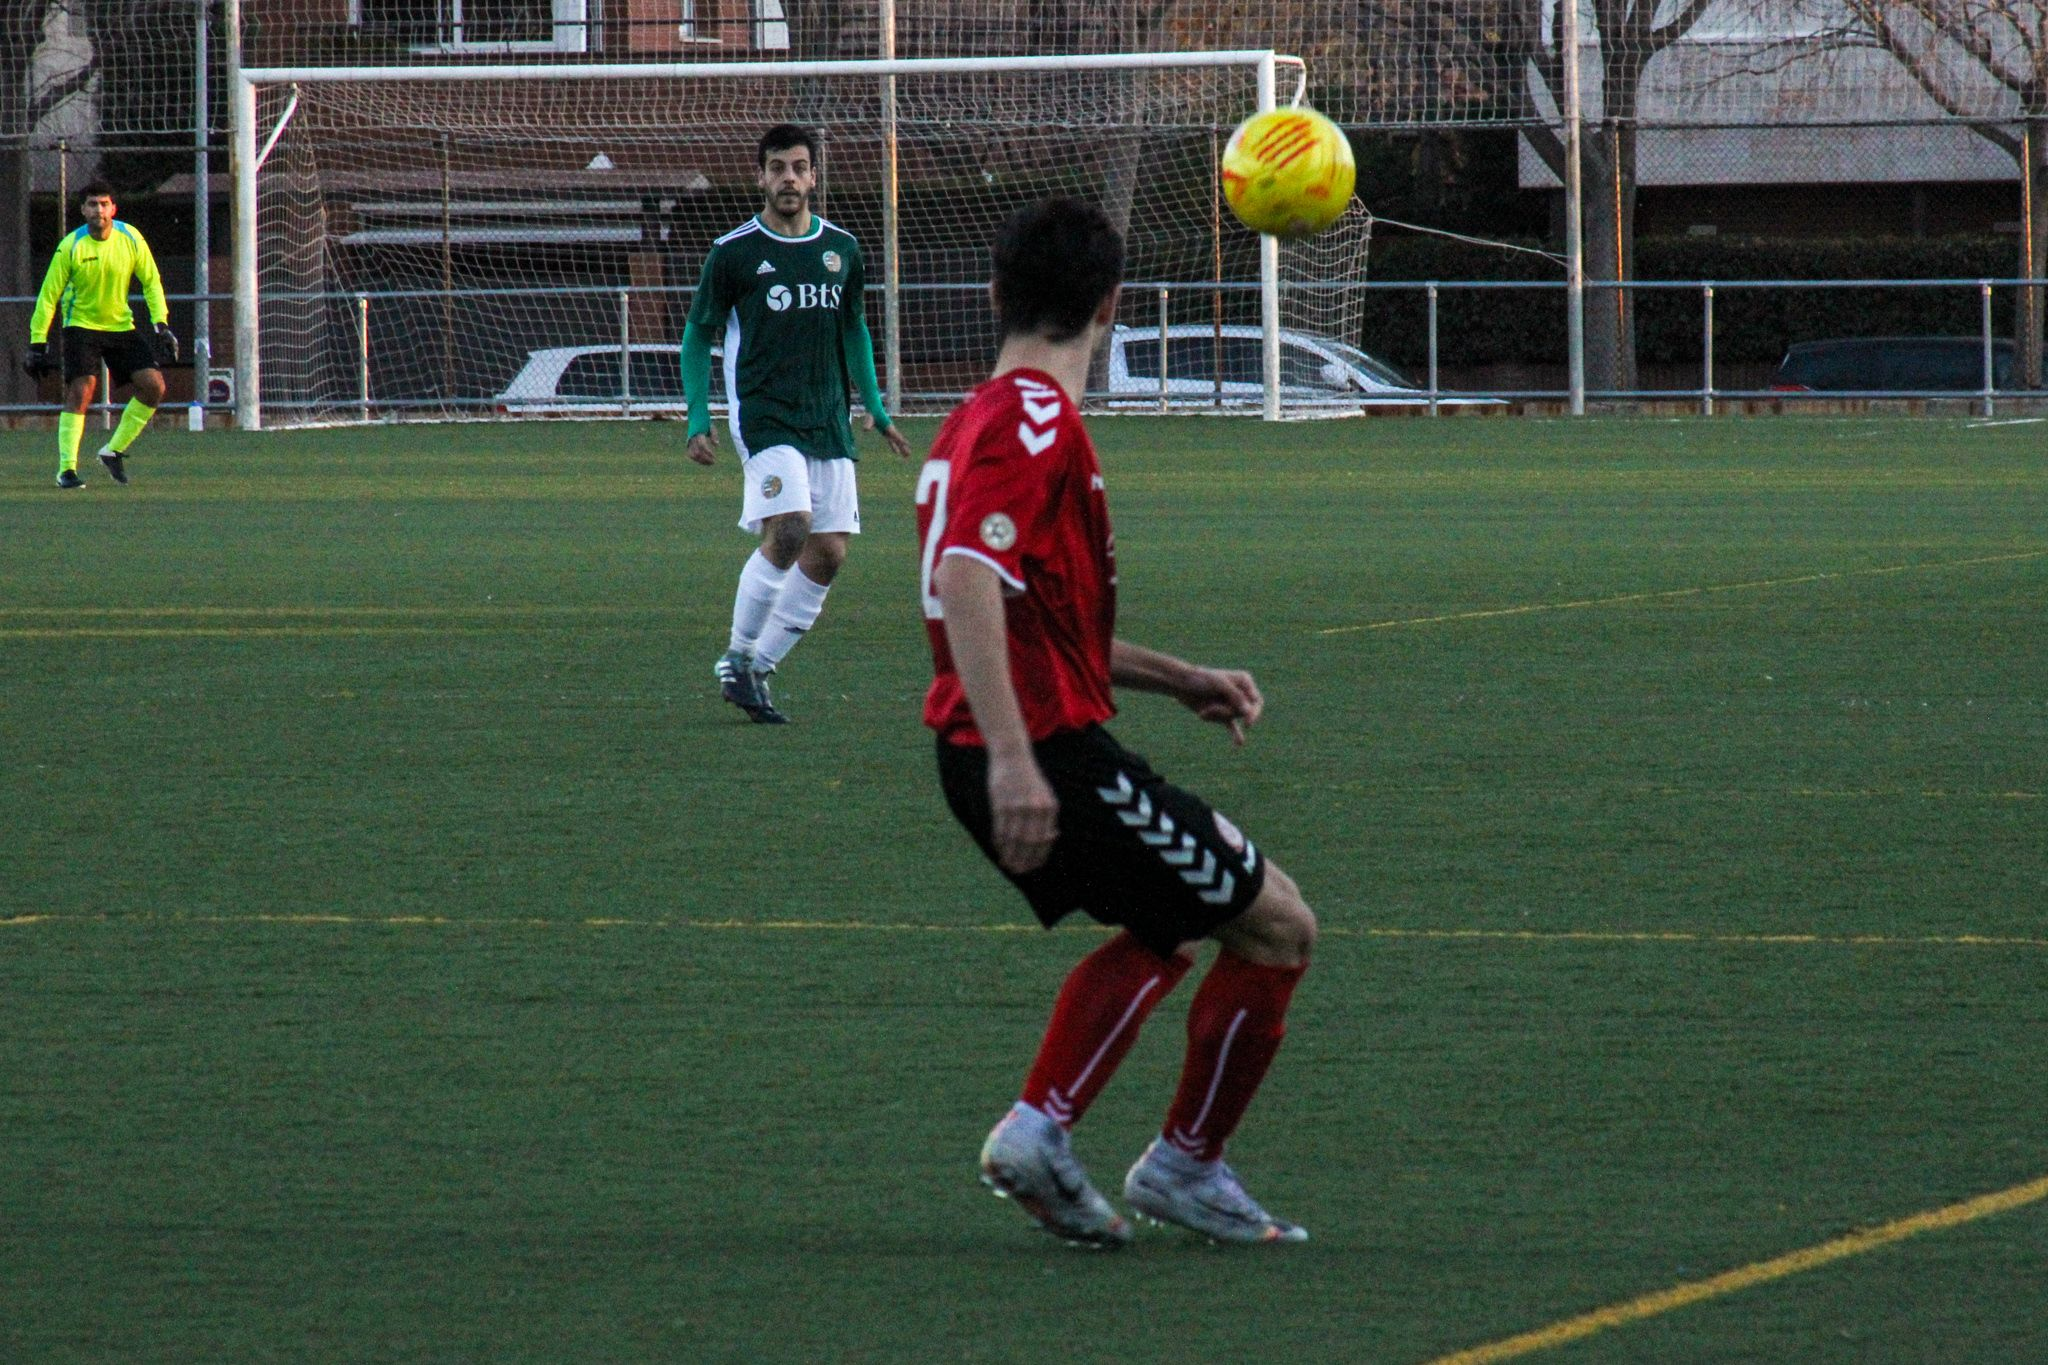 Lliga futbol masculí. Valldoreix FC-UD Marianao Poblet. FOTO: Ale Gómez